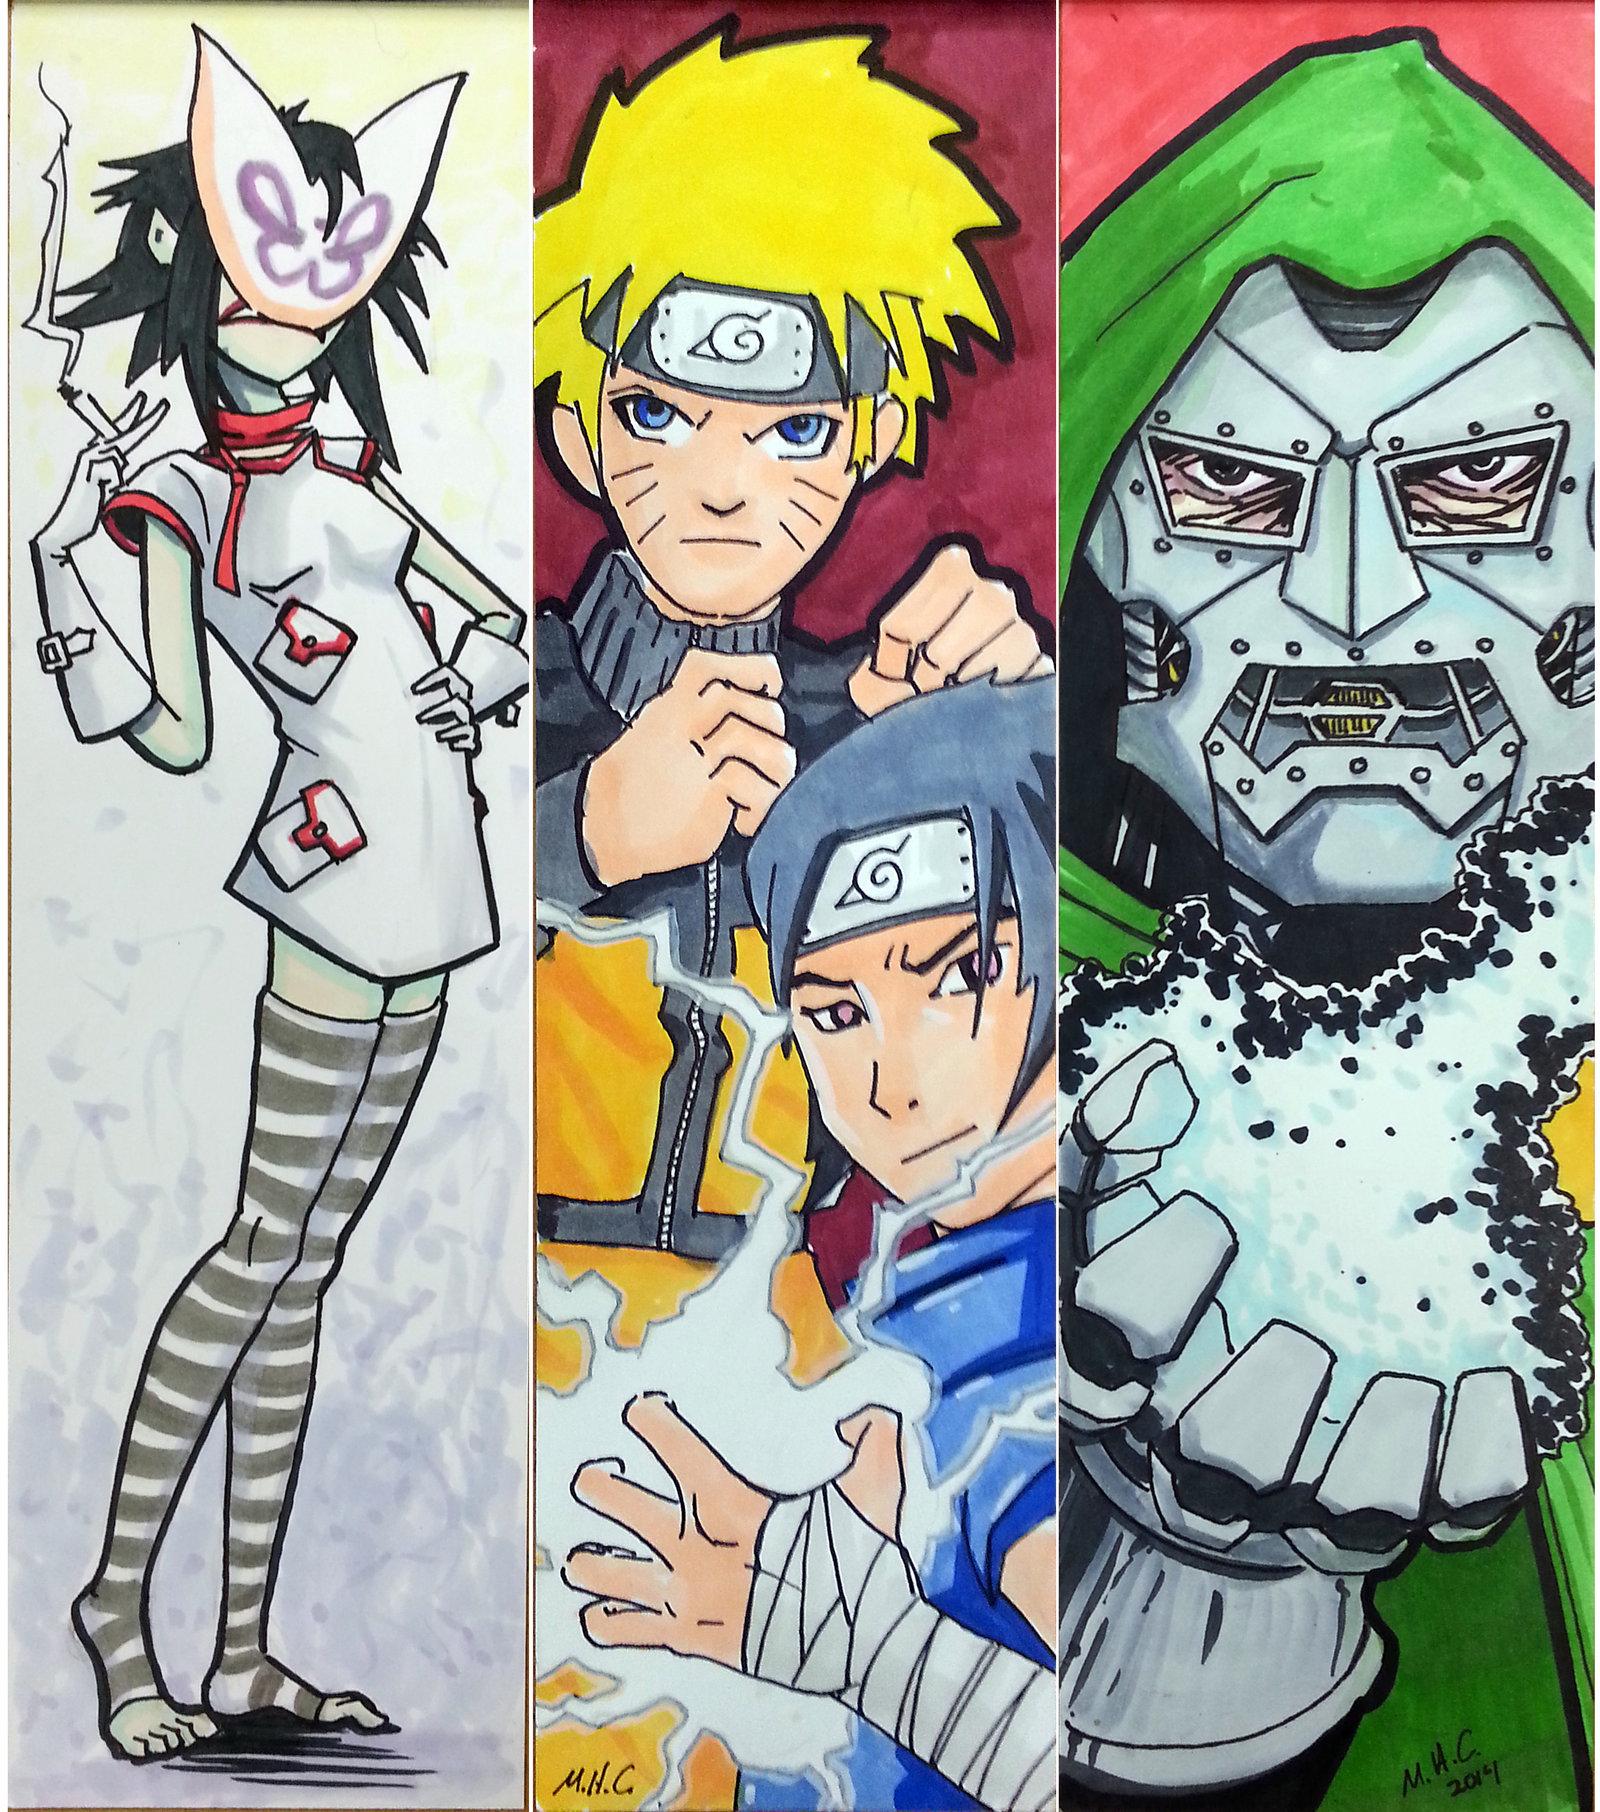 Japanese Anime And Comics Bookmarks Free Printable Papercraft Templates